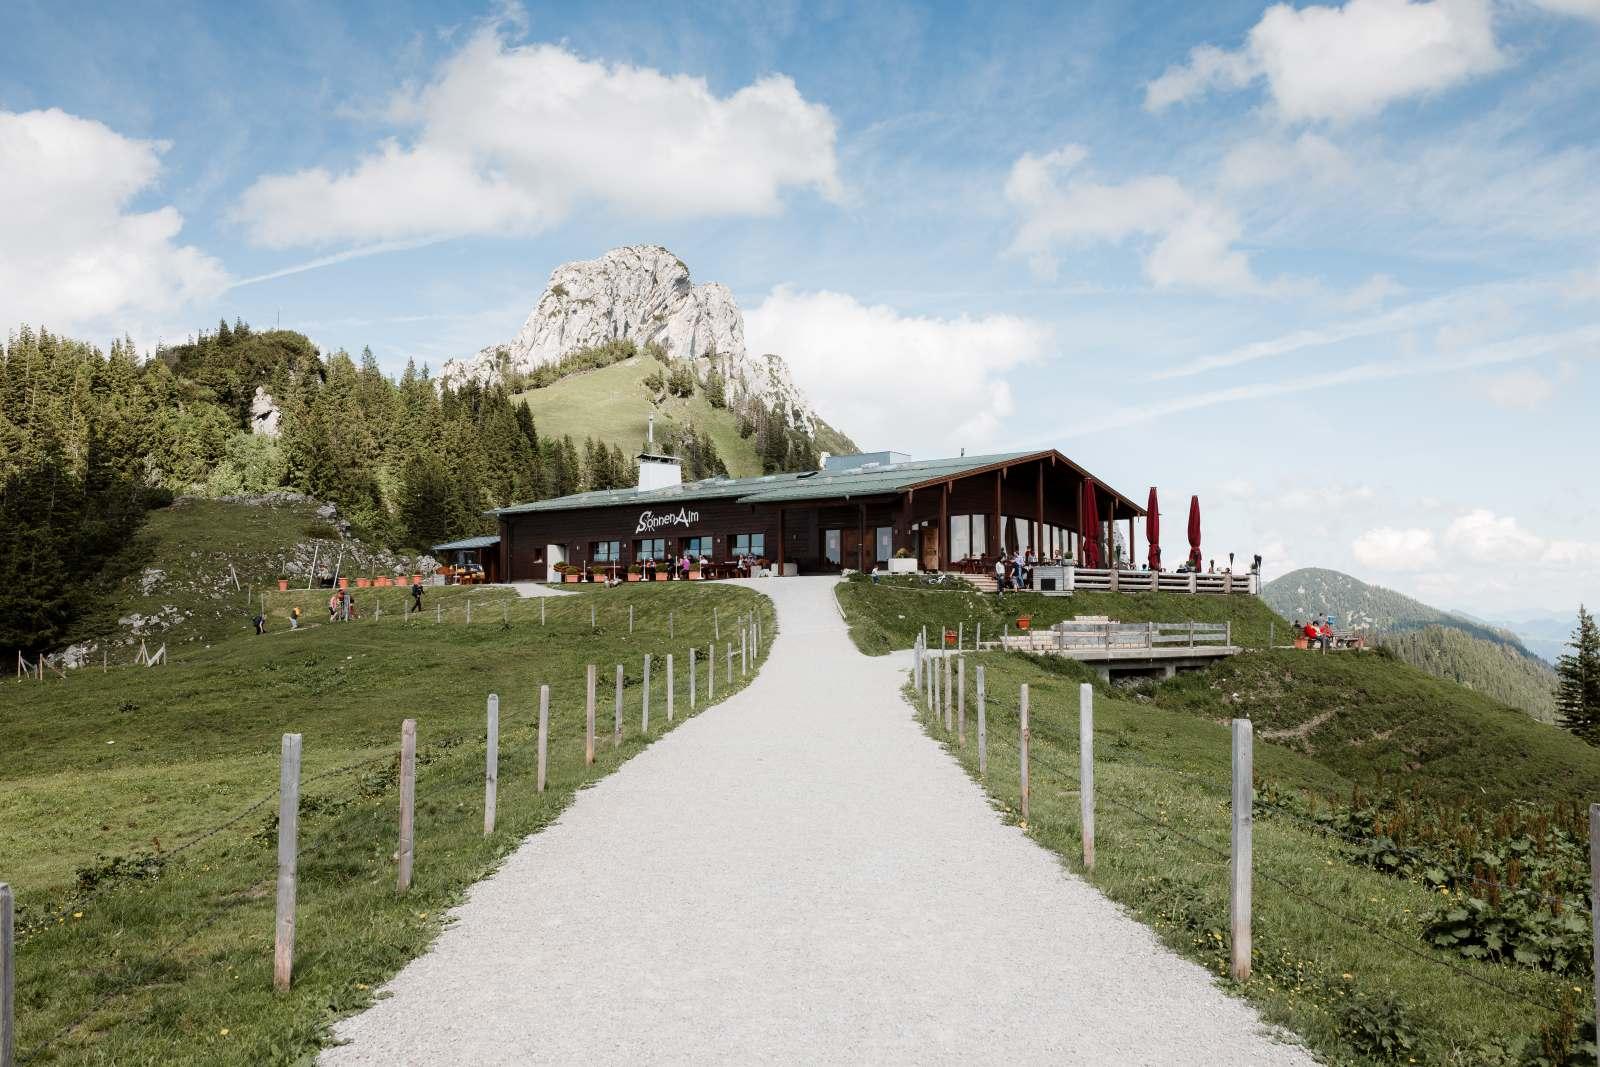 freie Trauung Chiemgau Kampenwand